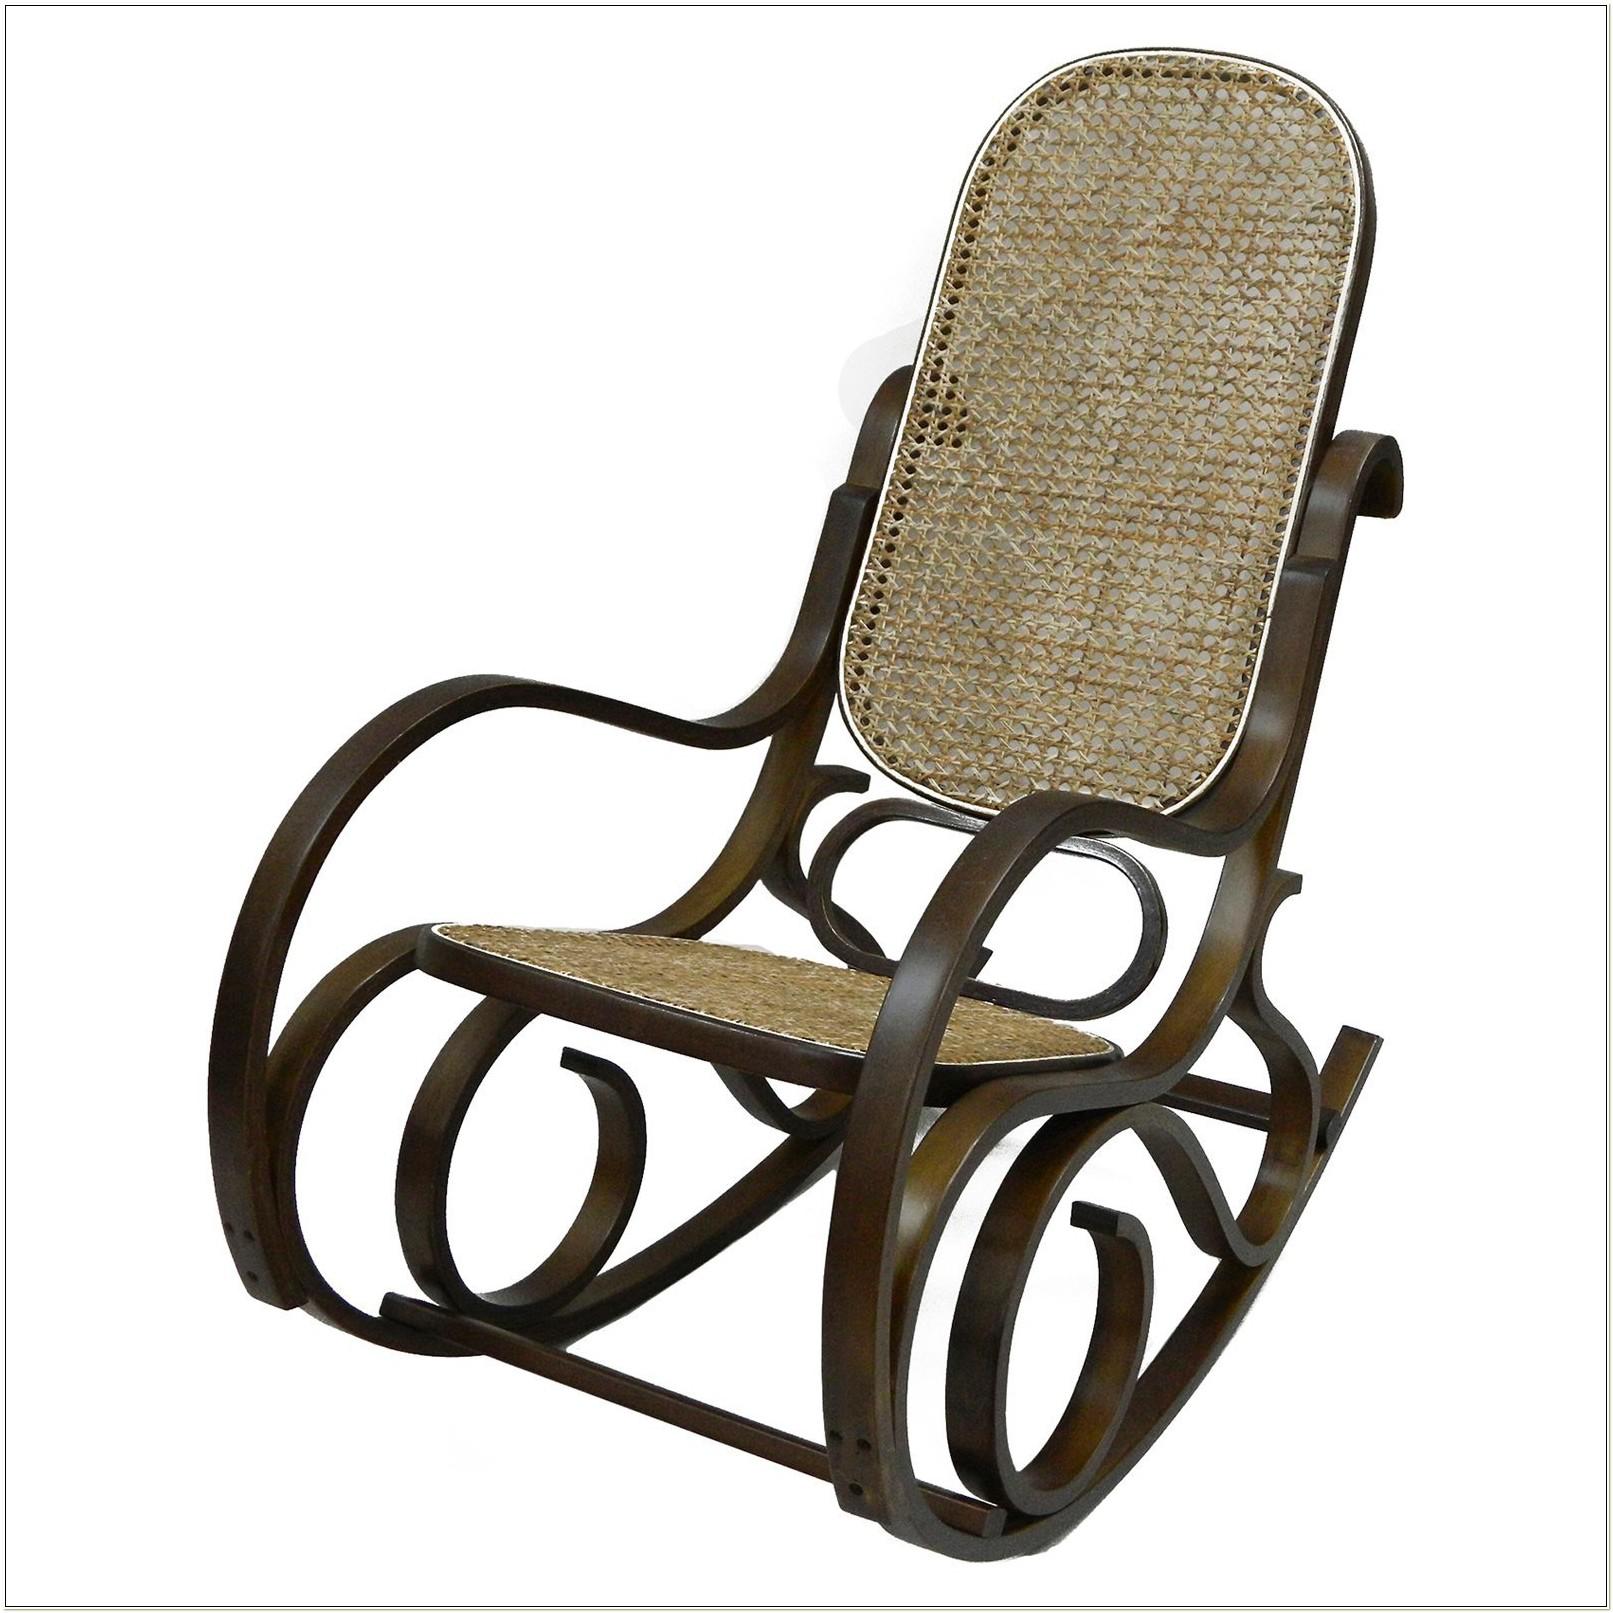 Carolina Cottage Victoria Bentwood Rocking Chair